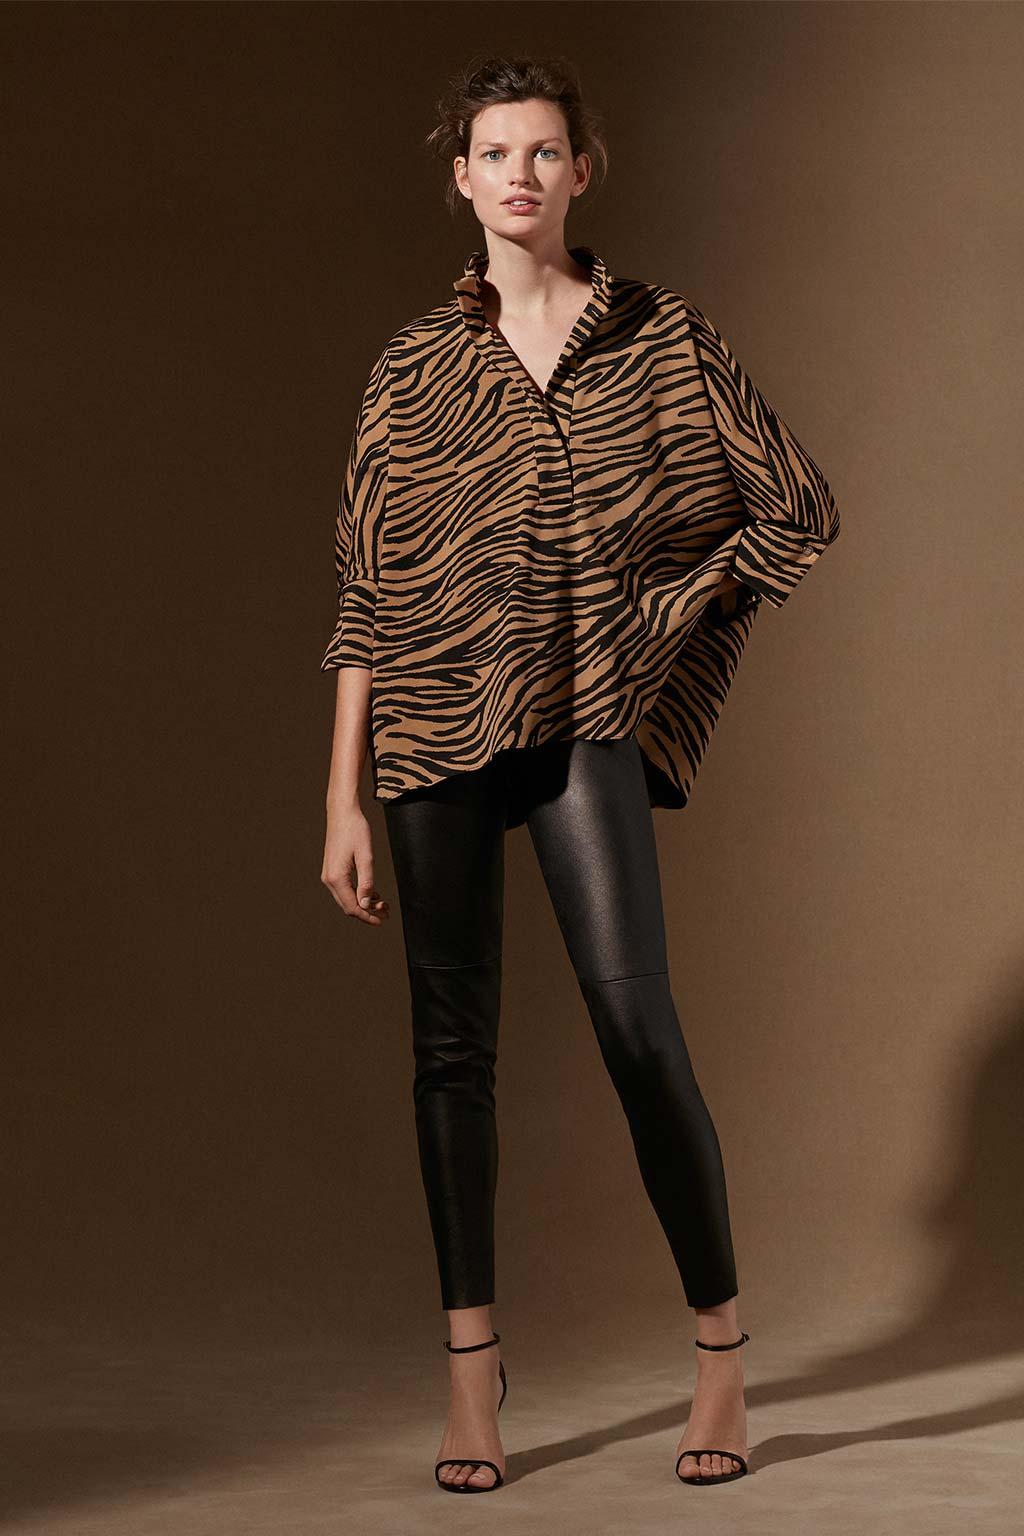 CH Carolina Herrera. New womenswear collection Spotlight. Look 17